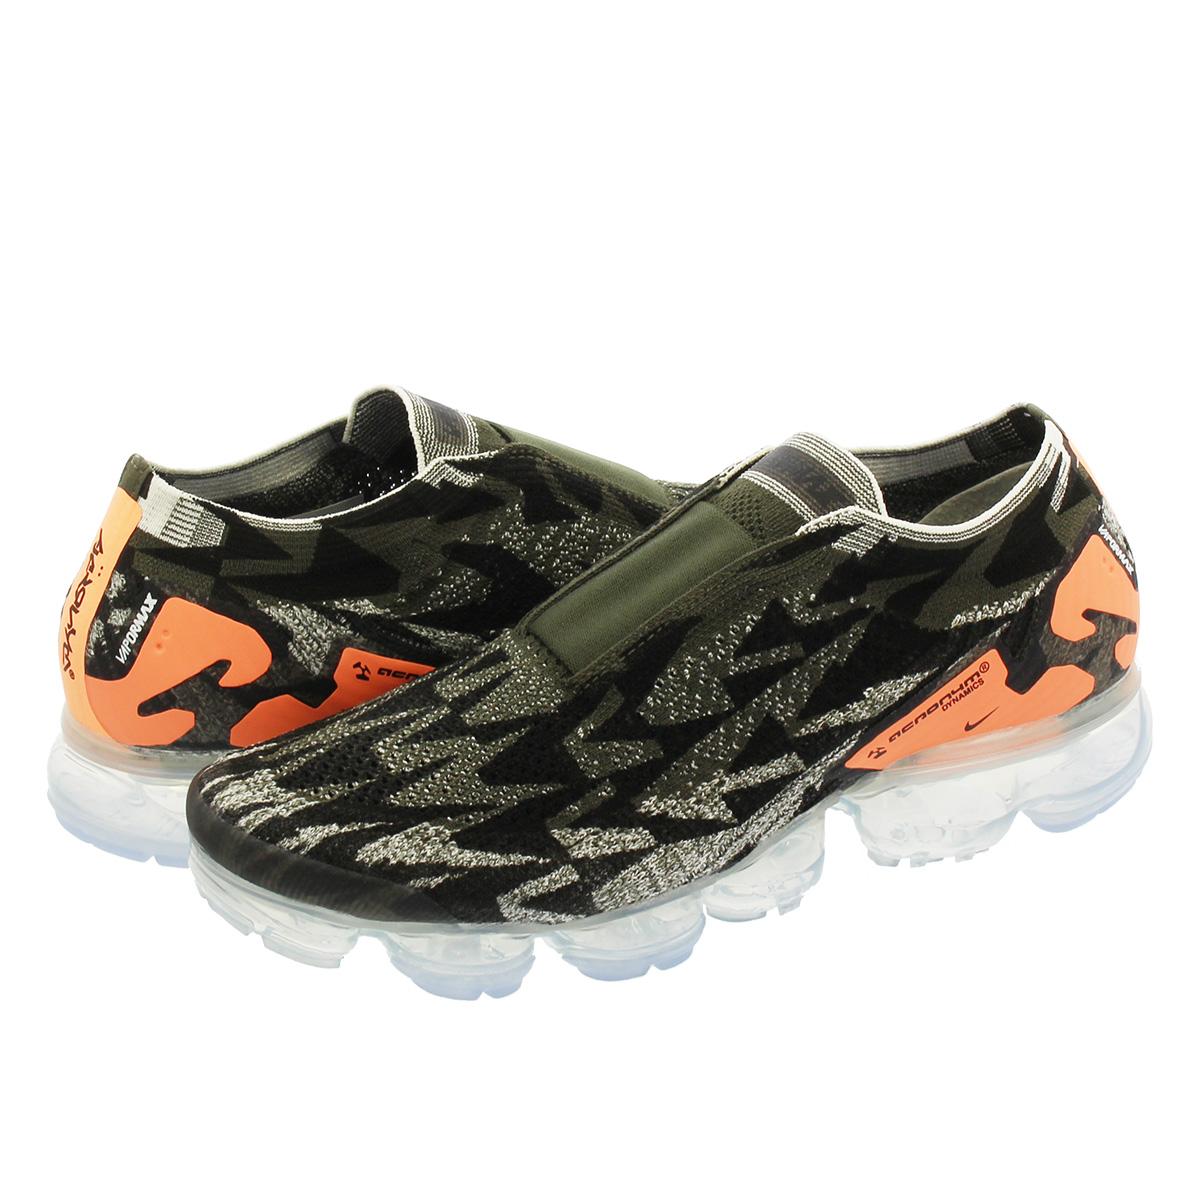 sneakers for cheap 69ada 81a3a NIKE X ACRONYM AIR VAPORMAX MOC 2 Nike X アクロニウムエアヴェイパーマックスモック 2 SAIL CARGO  KHAKI DARK STUCCO aq0996-102